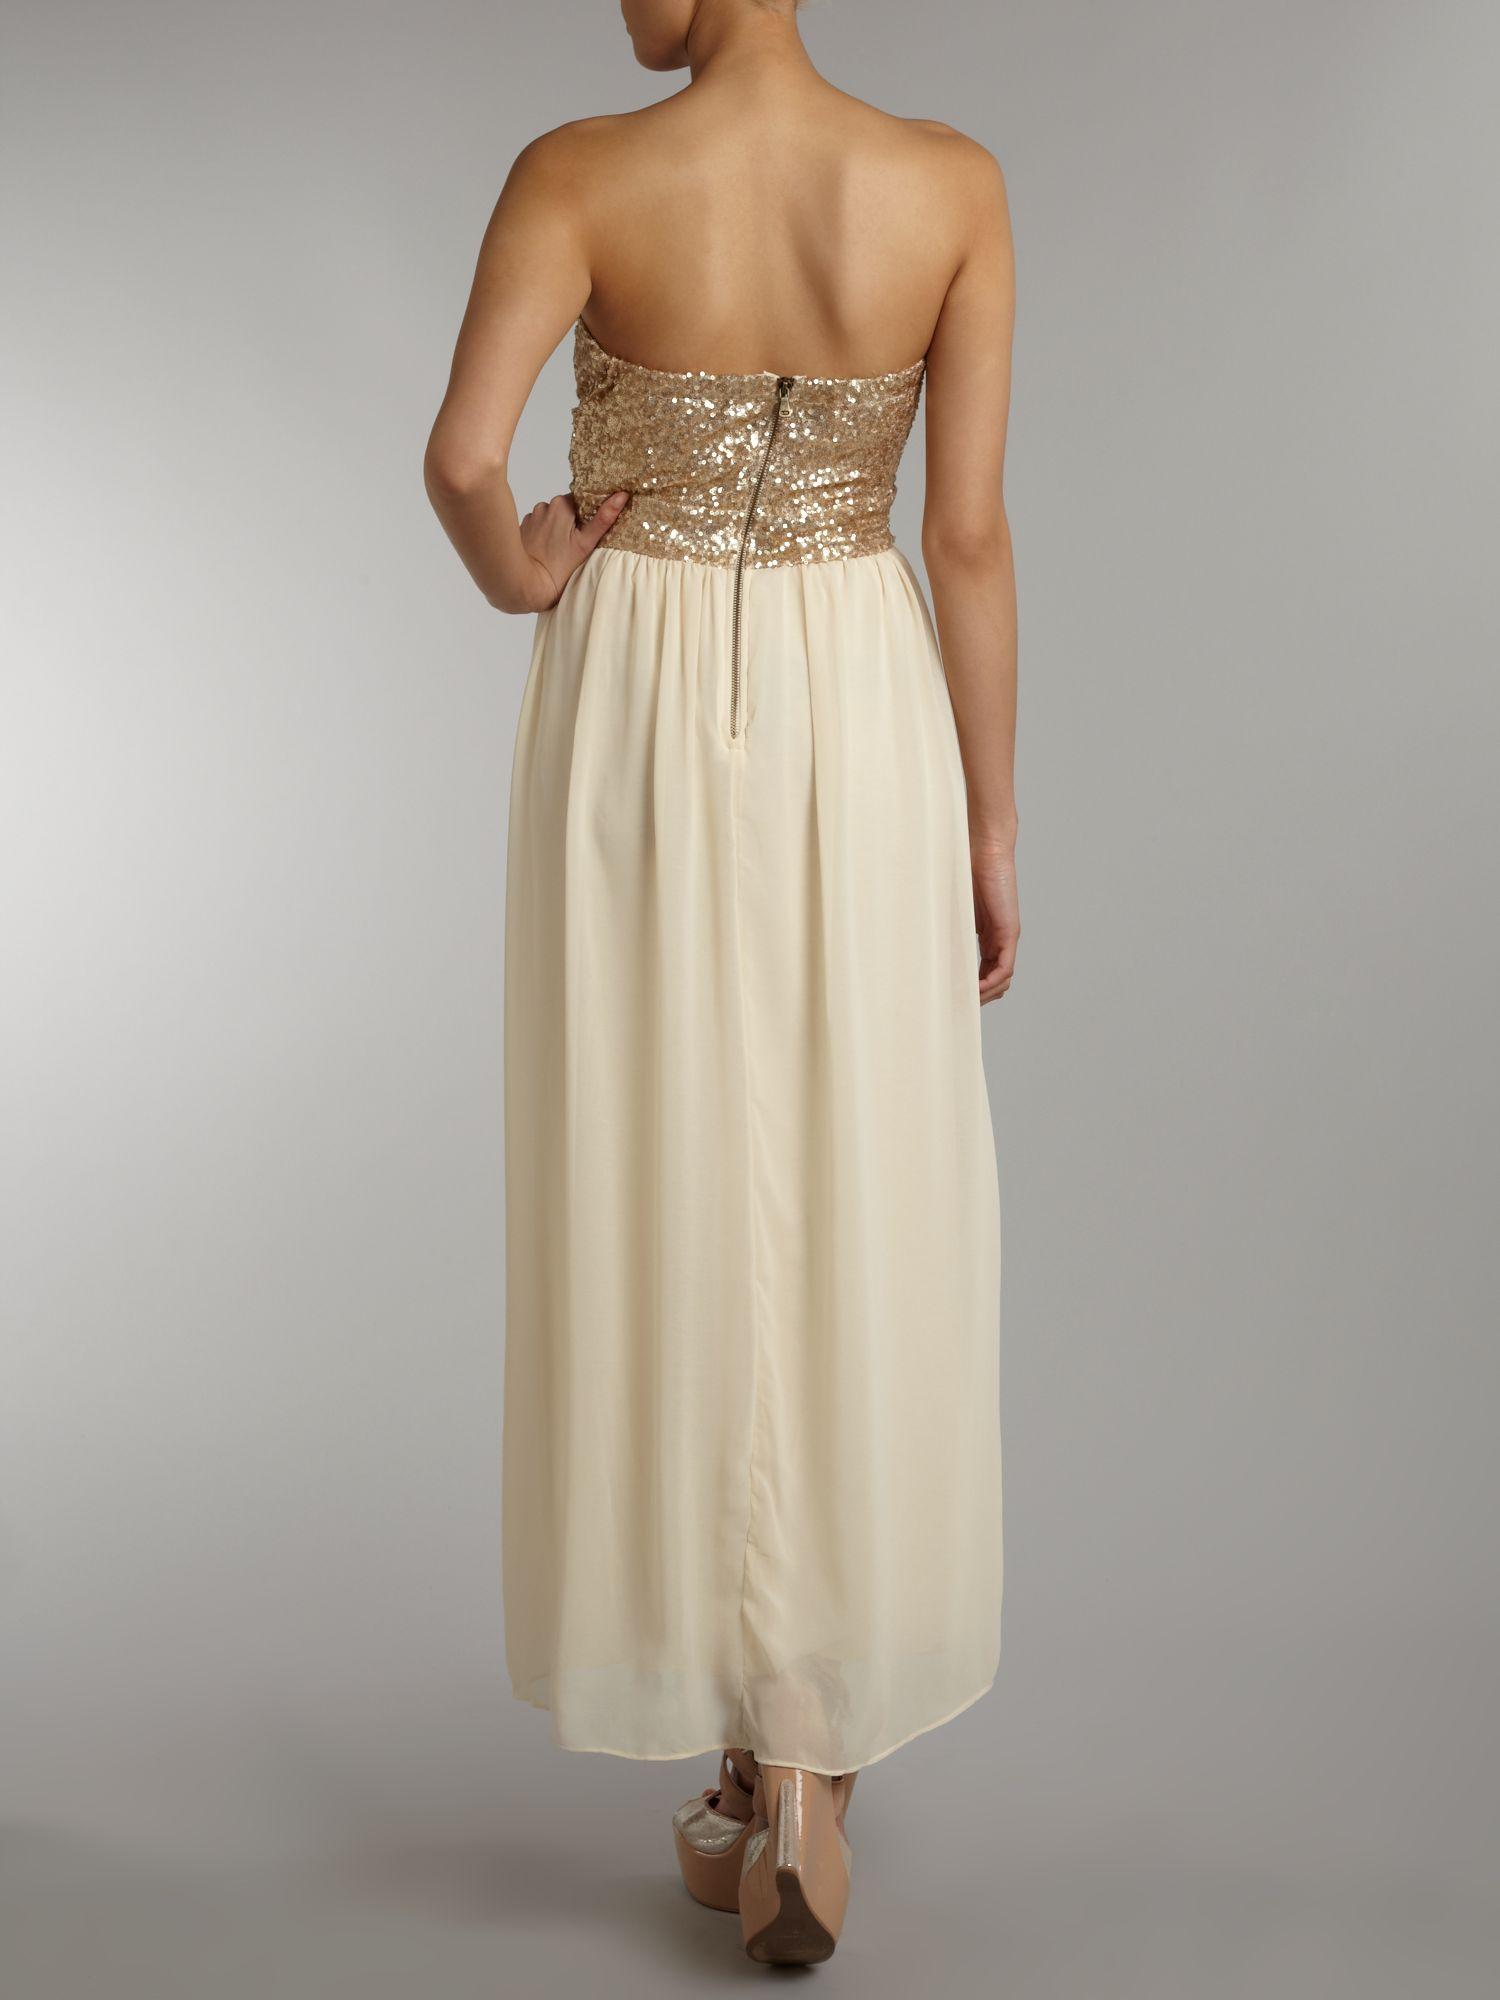 Tfnc london Sequin Top Maxi Dress in Metallic - Lyst